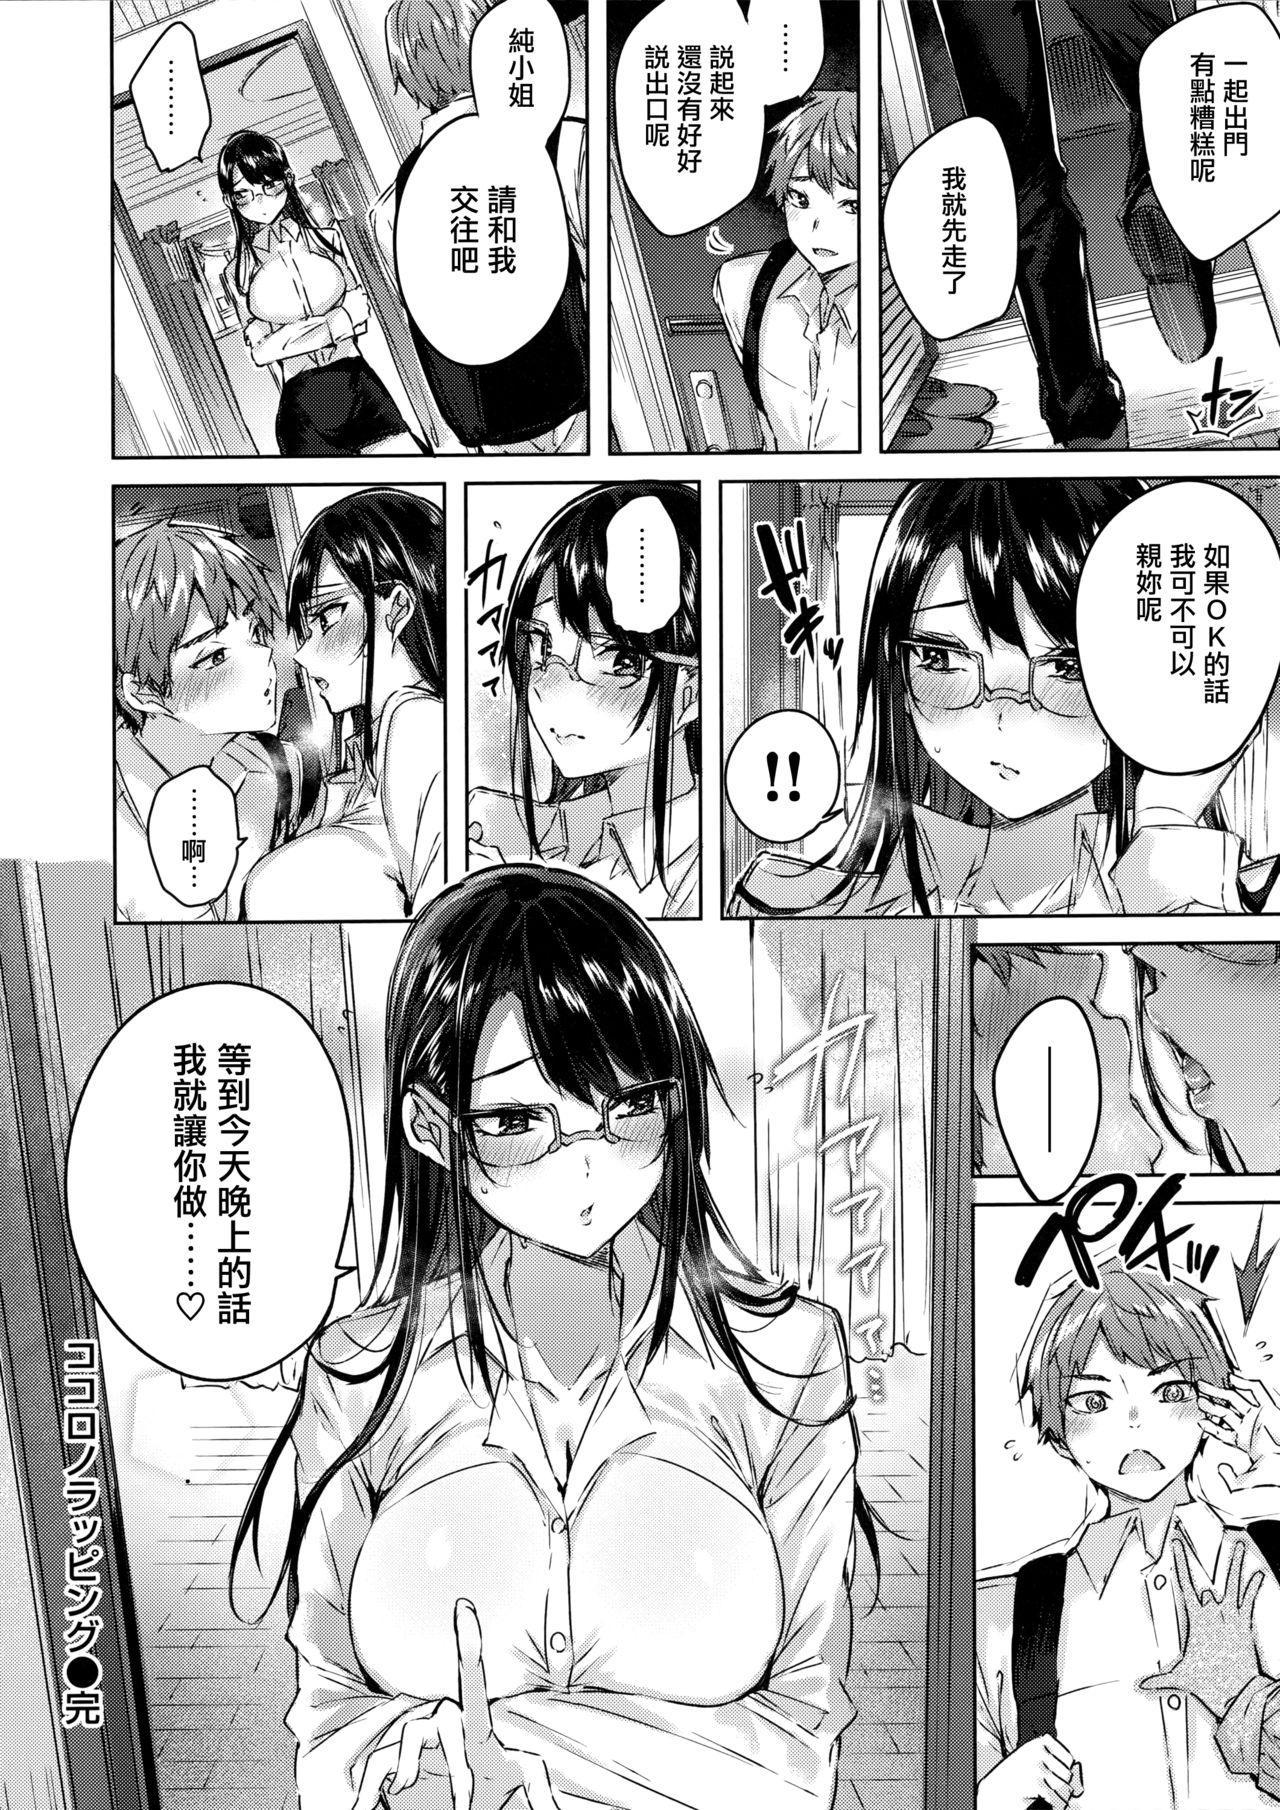 [Kakao] Nakadashi Strike! - Winning strike! Ch. 1-2  [Chinese] [兔司姬漢化組] 45